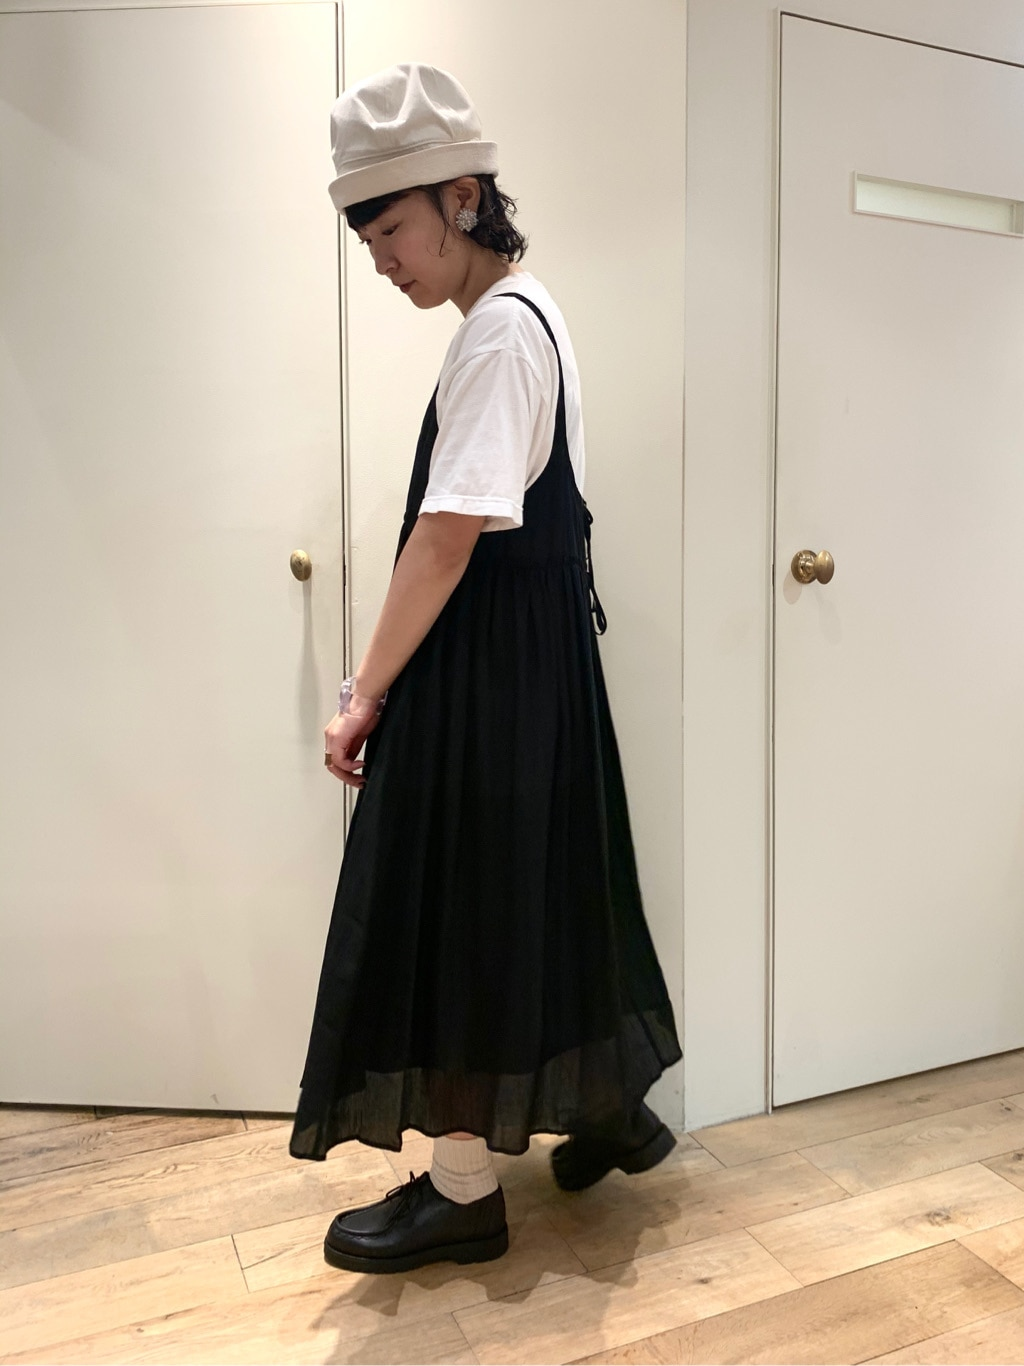 bulle de savon 新宿ミロード 身長:159cm 2020.06.29